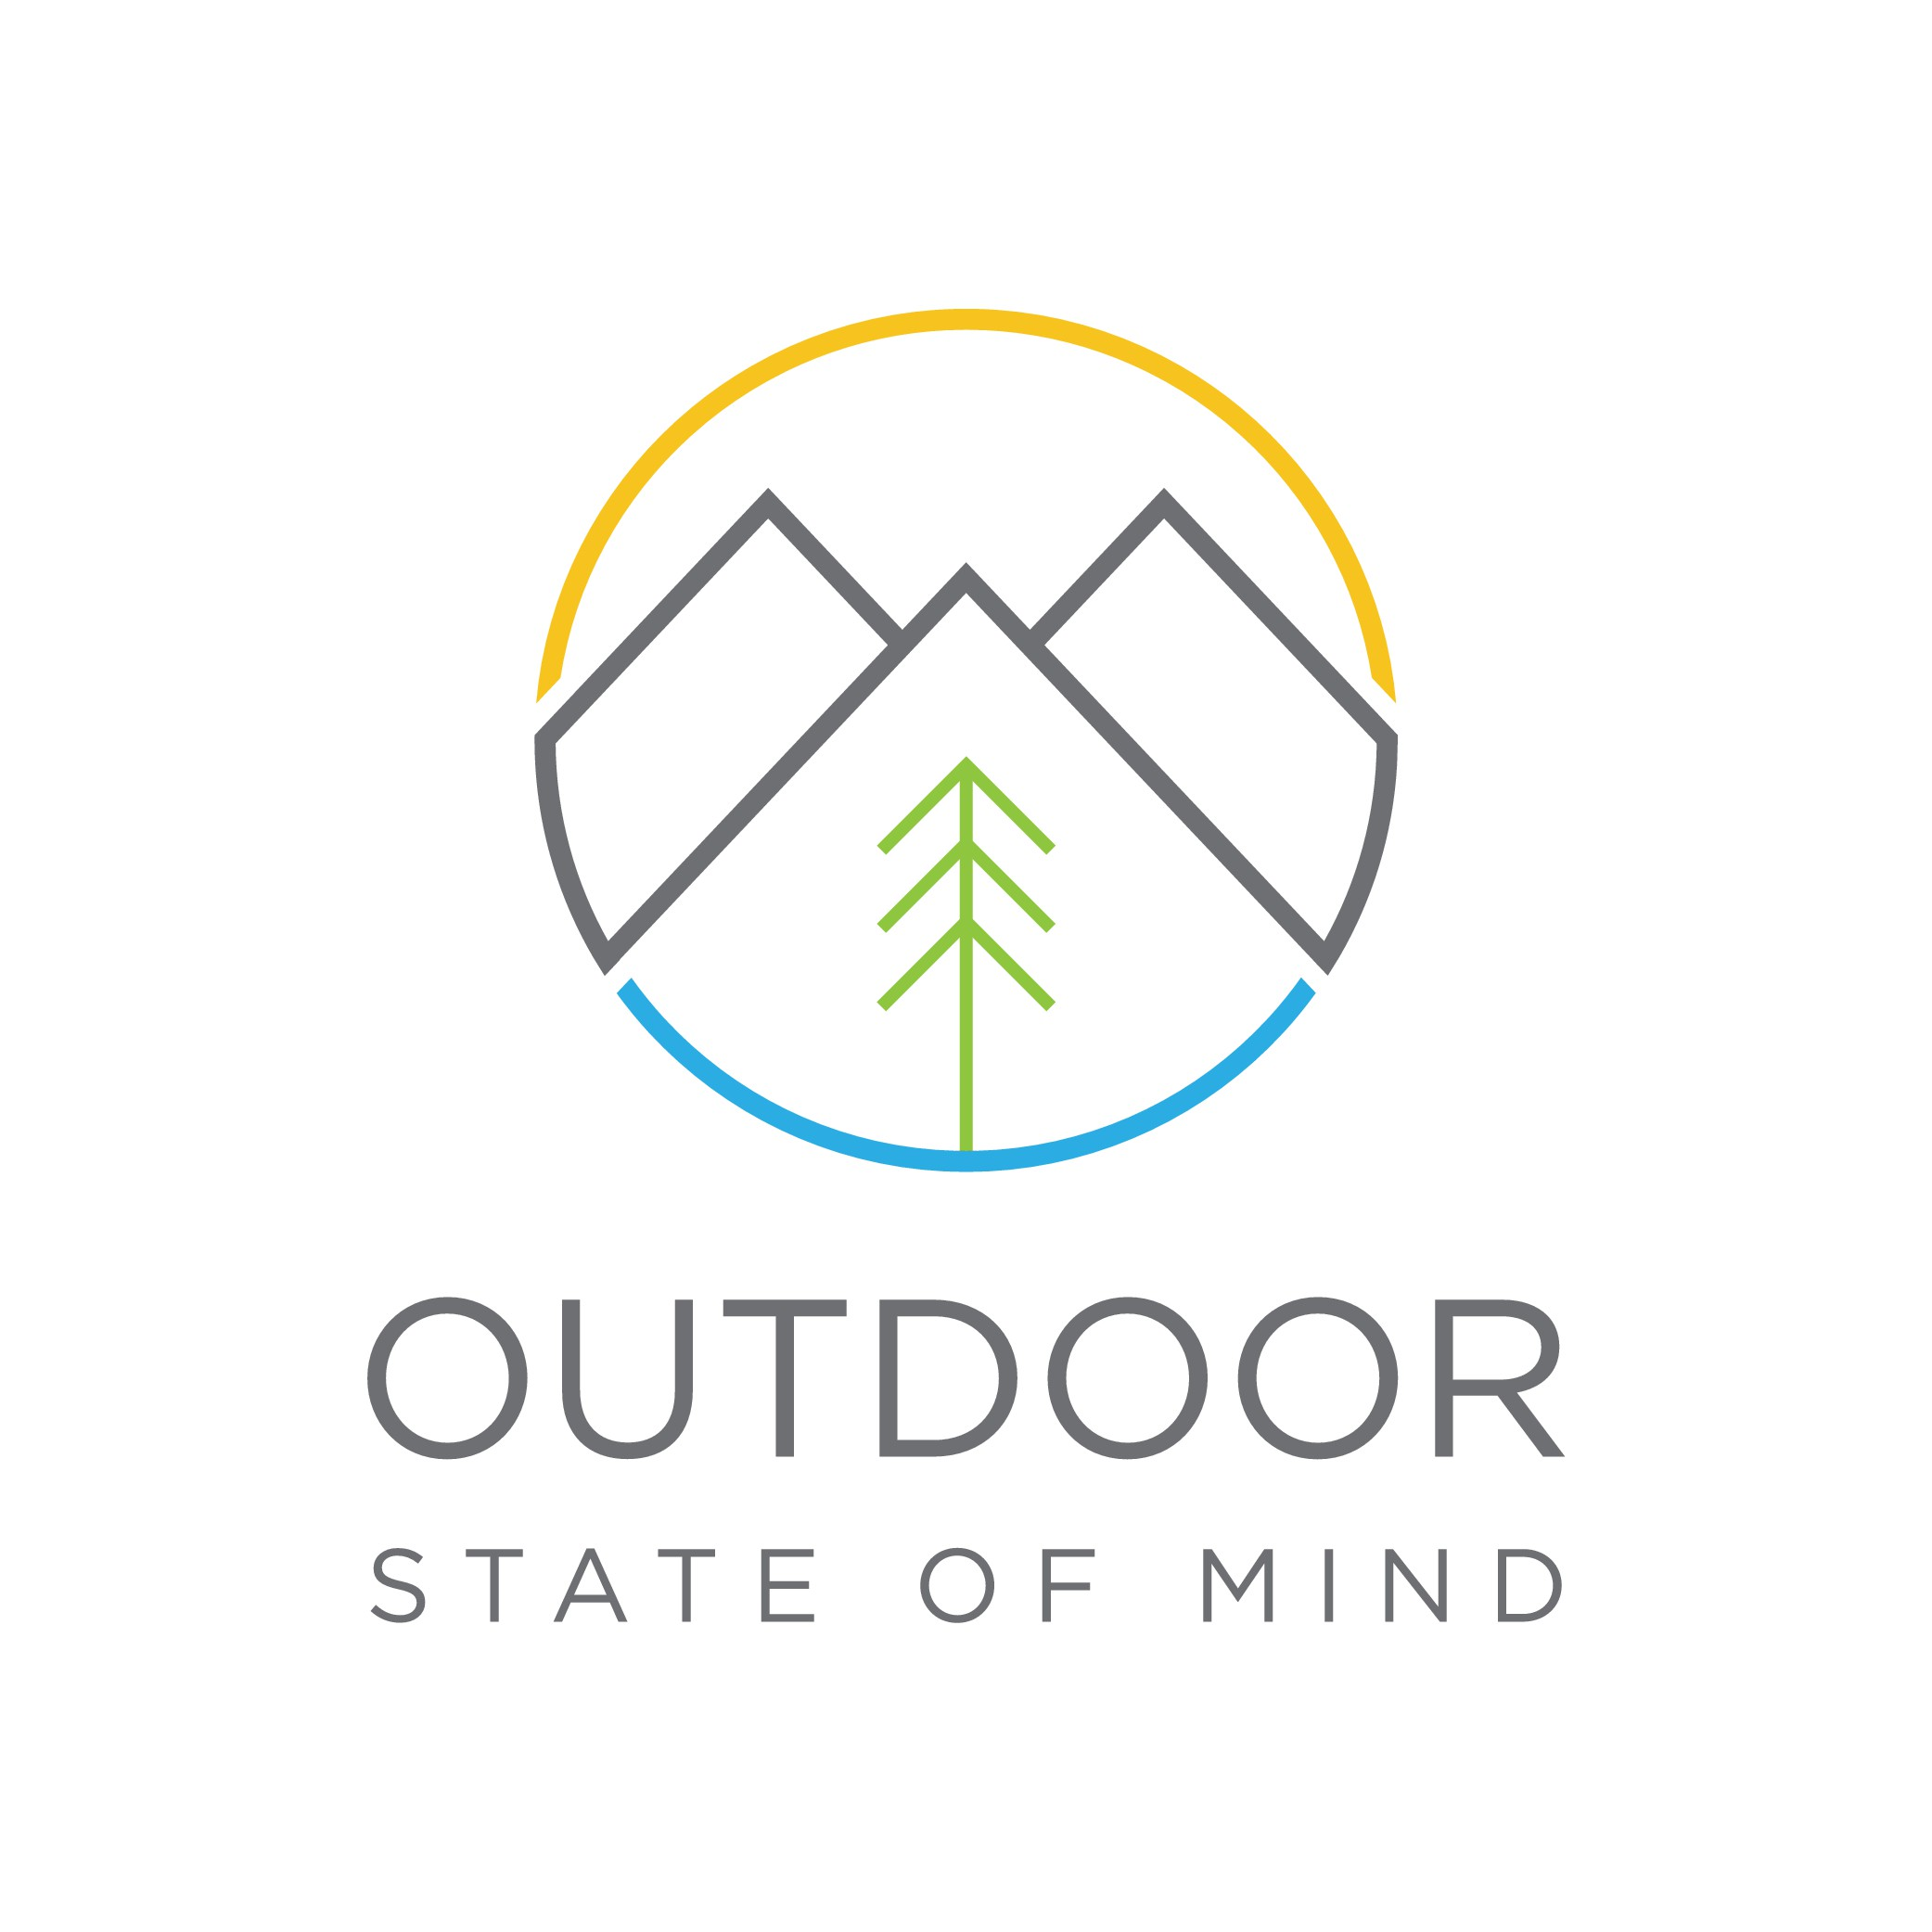 New outdoor company needs creative mastermind to design a logo!!